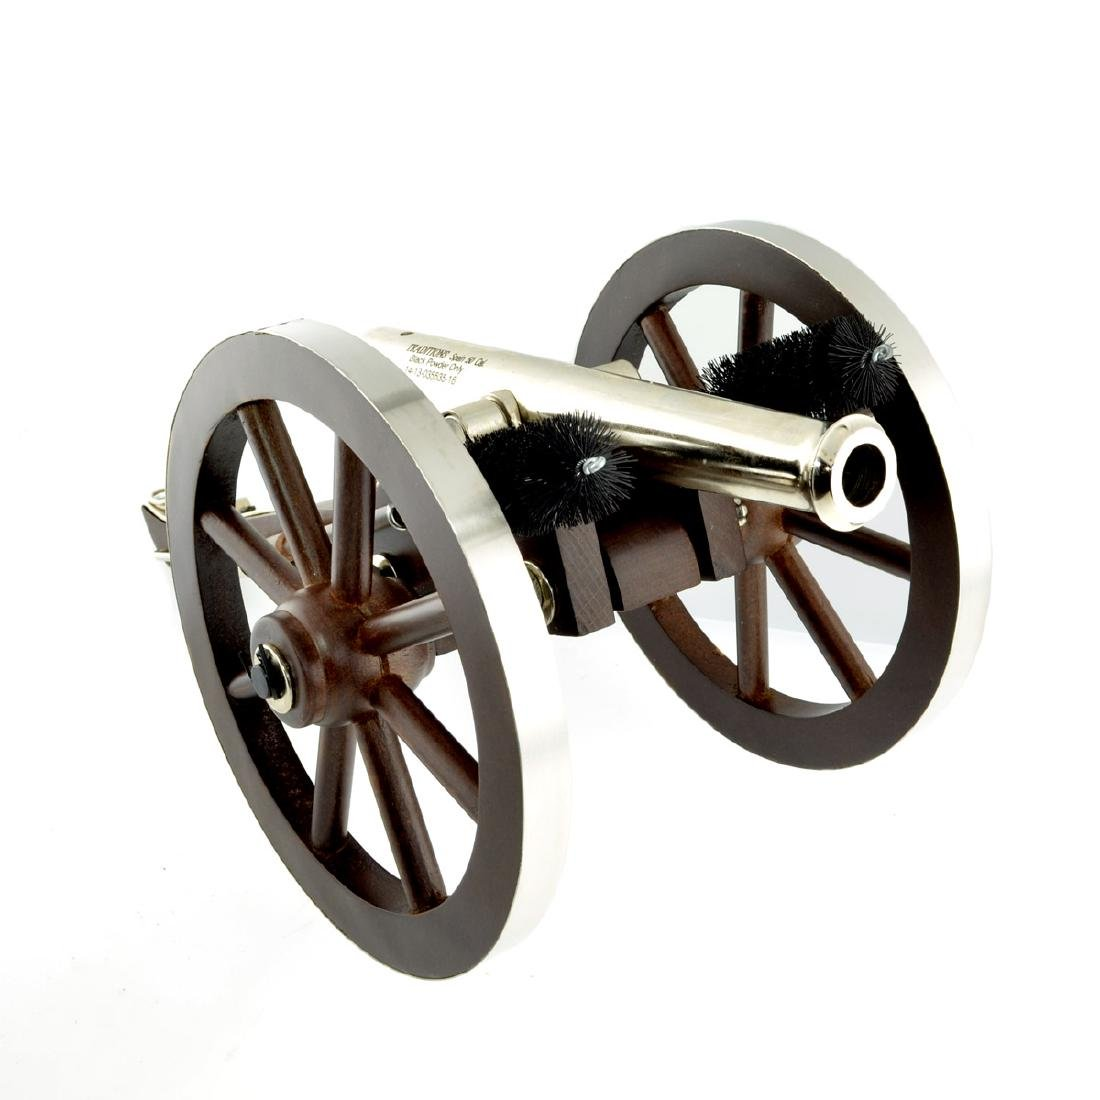 Mini Napoleon III Cannon .50 Cal Smoothrore - 11/4''